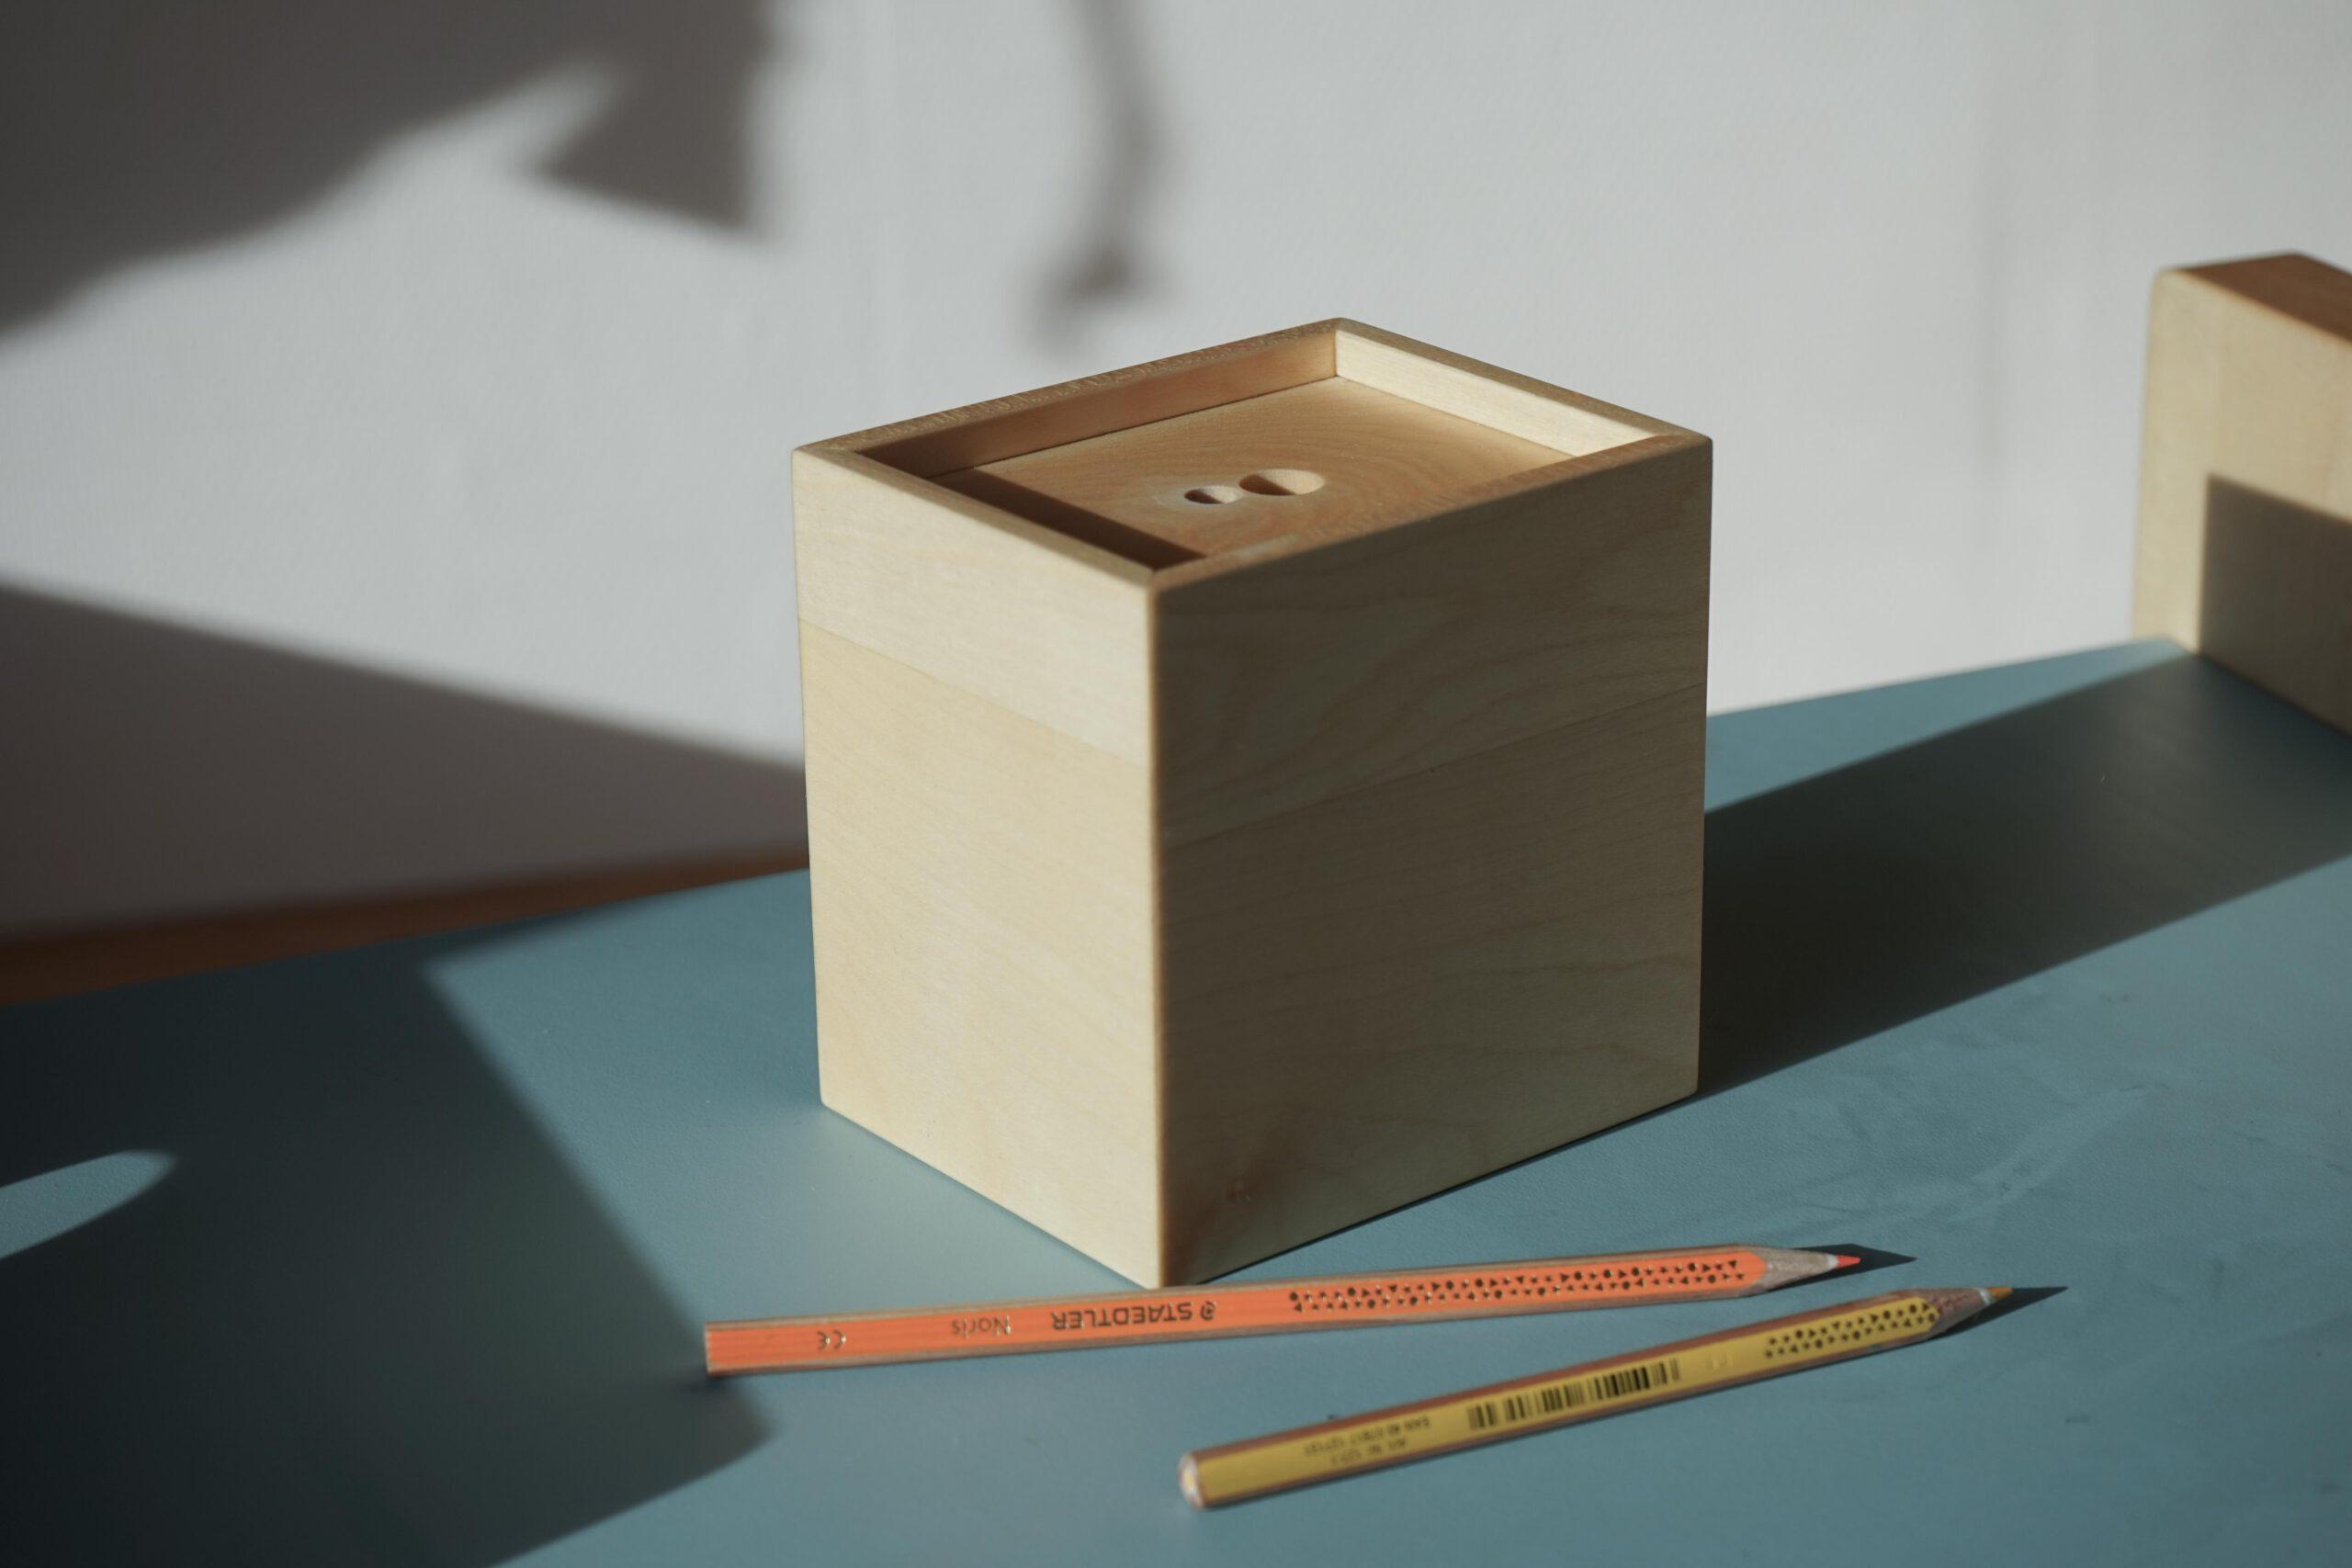 lenaturel-Schreibtisch-Aufsätze-2